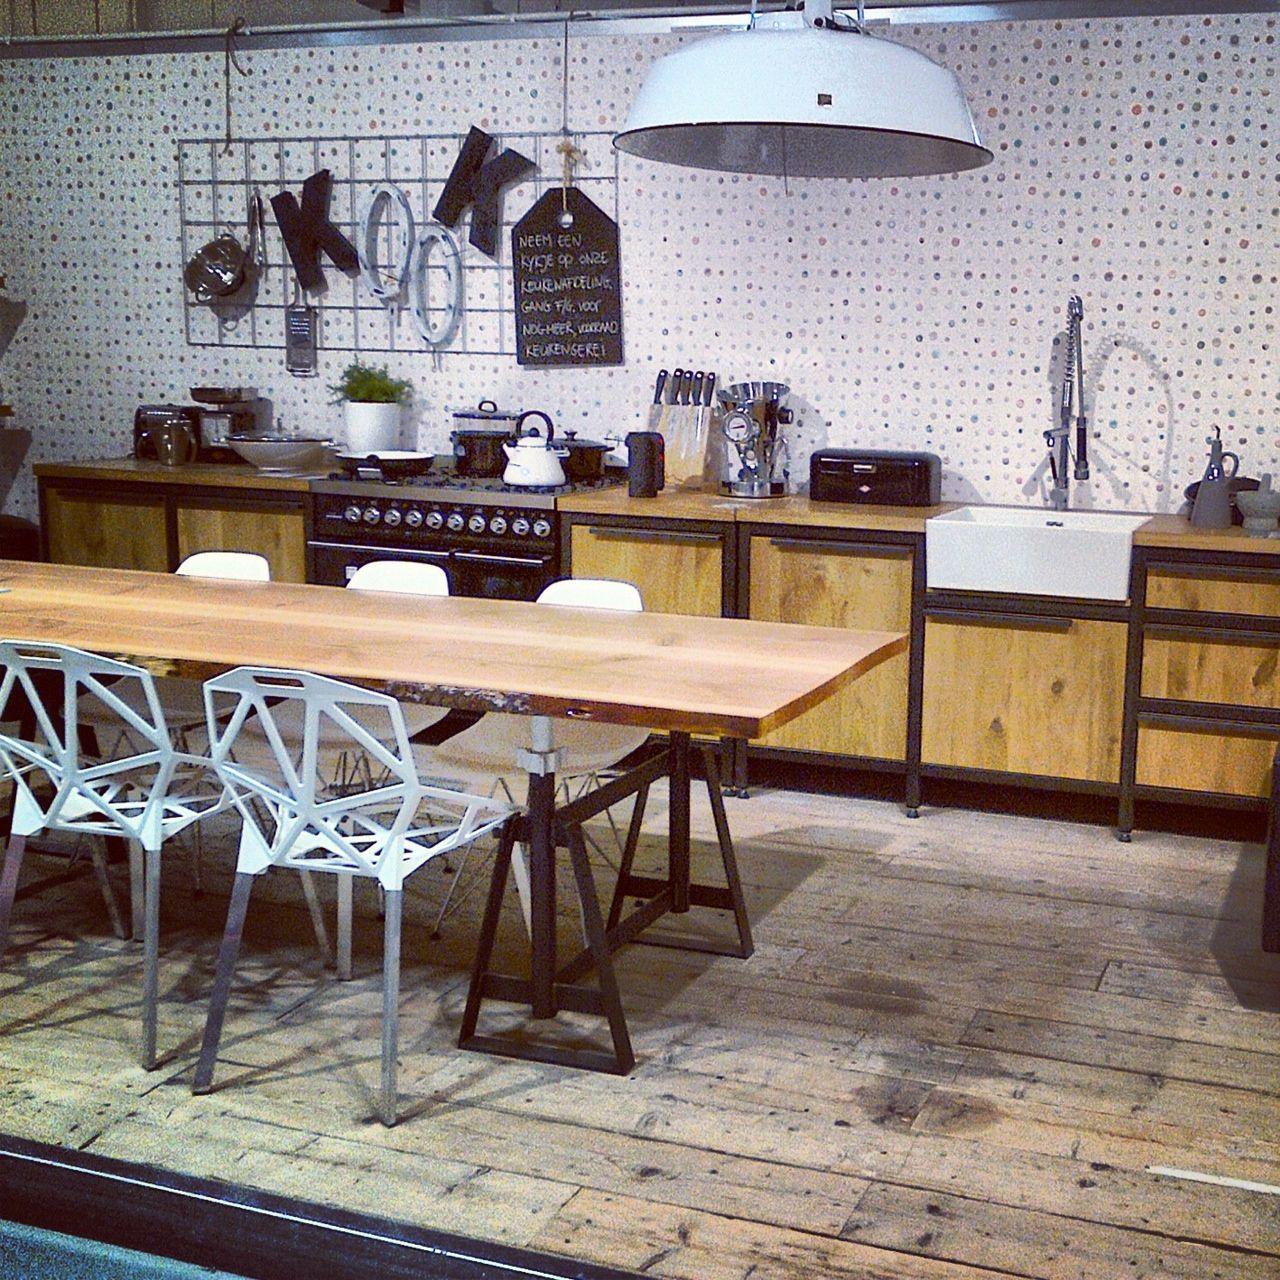 Vm design keuken tafel schraag tree loods5 zaandam vm design inspiration pinterest - Tafel design keuken ...